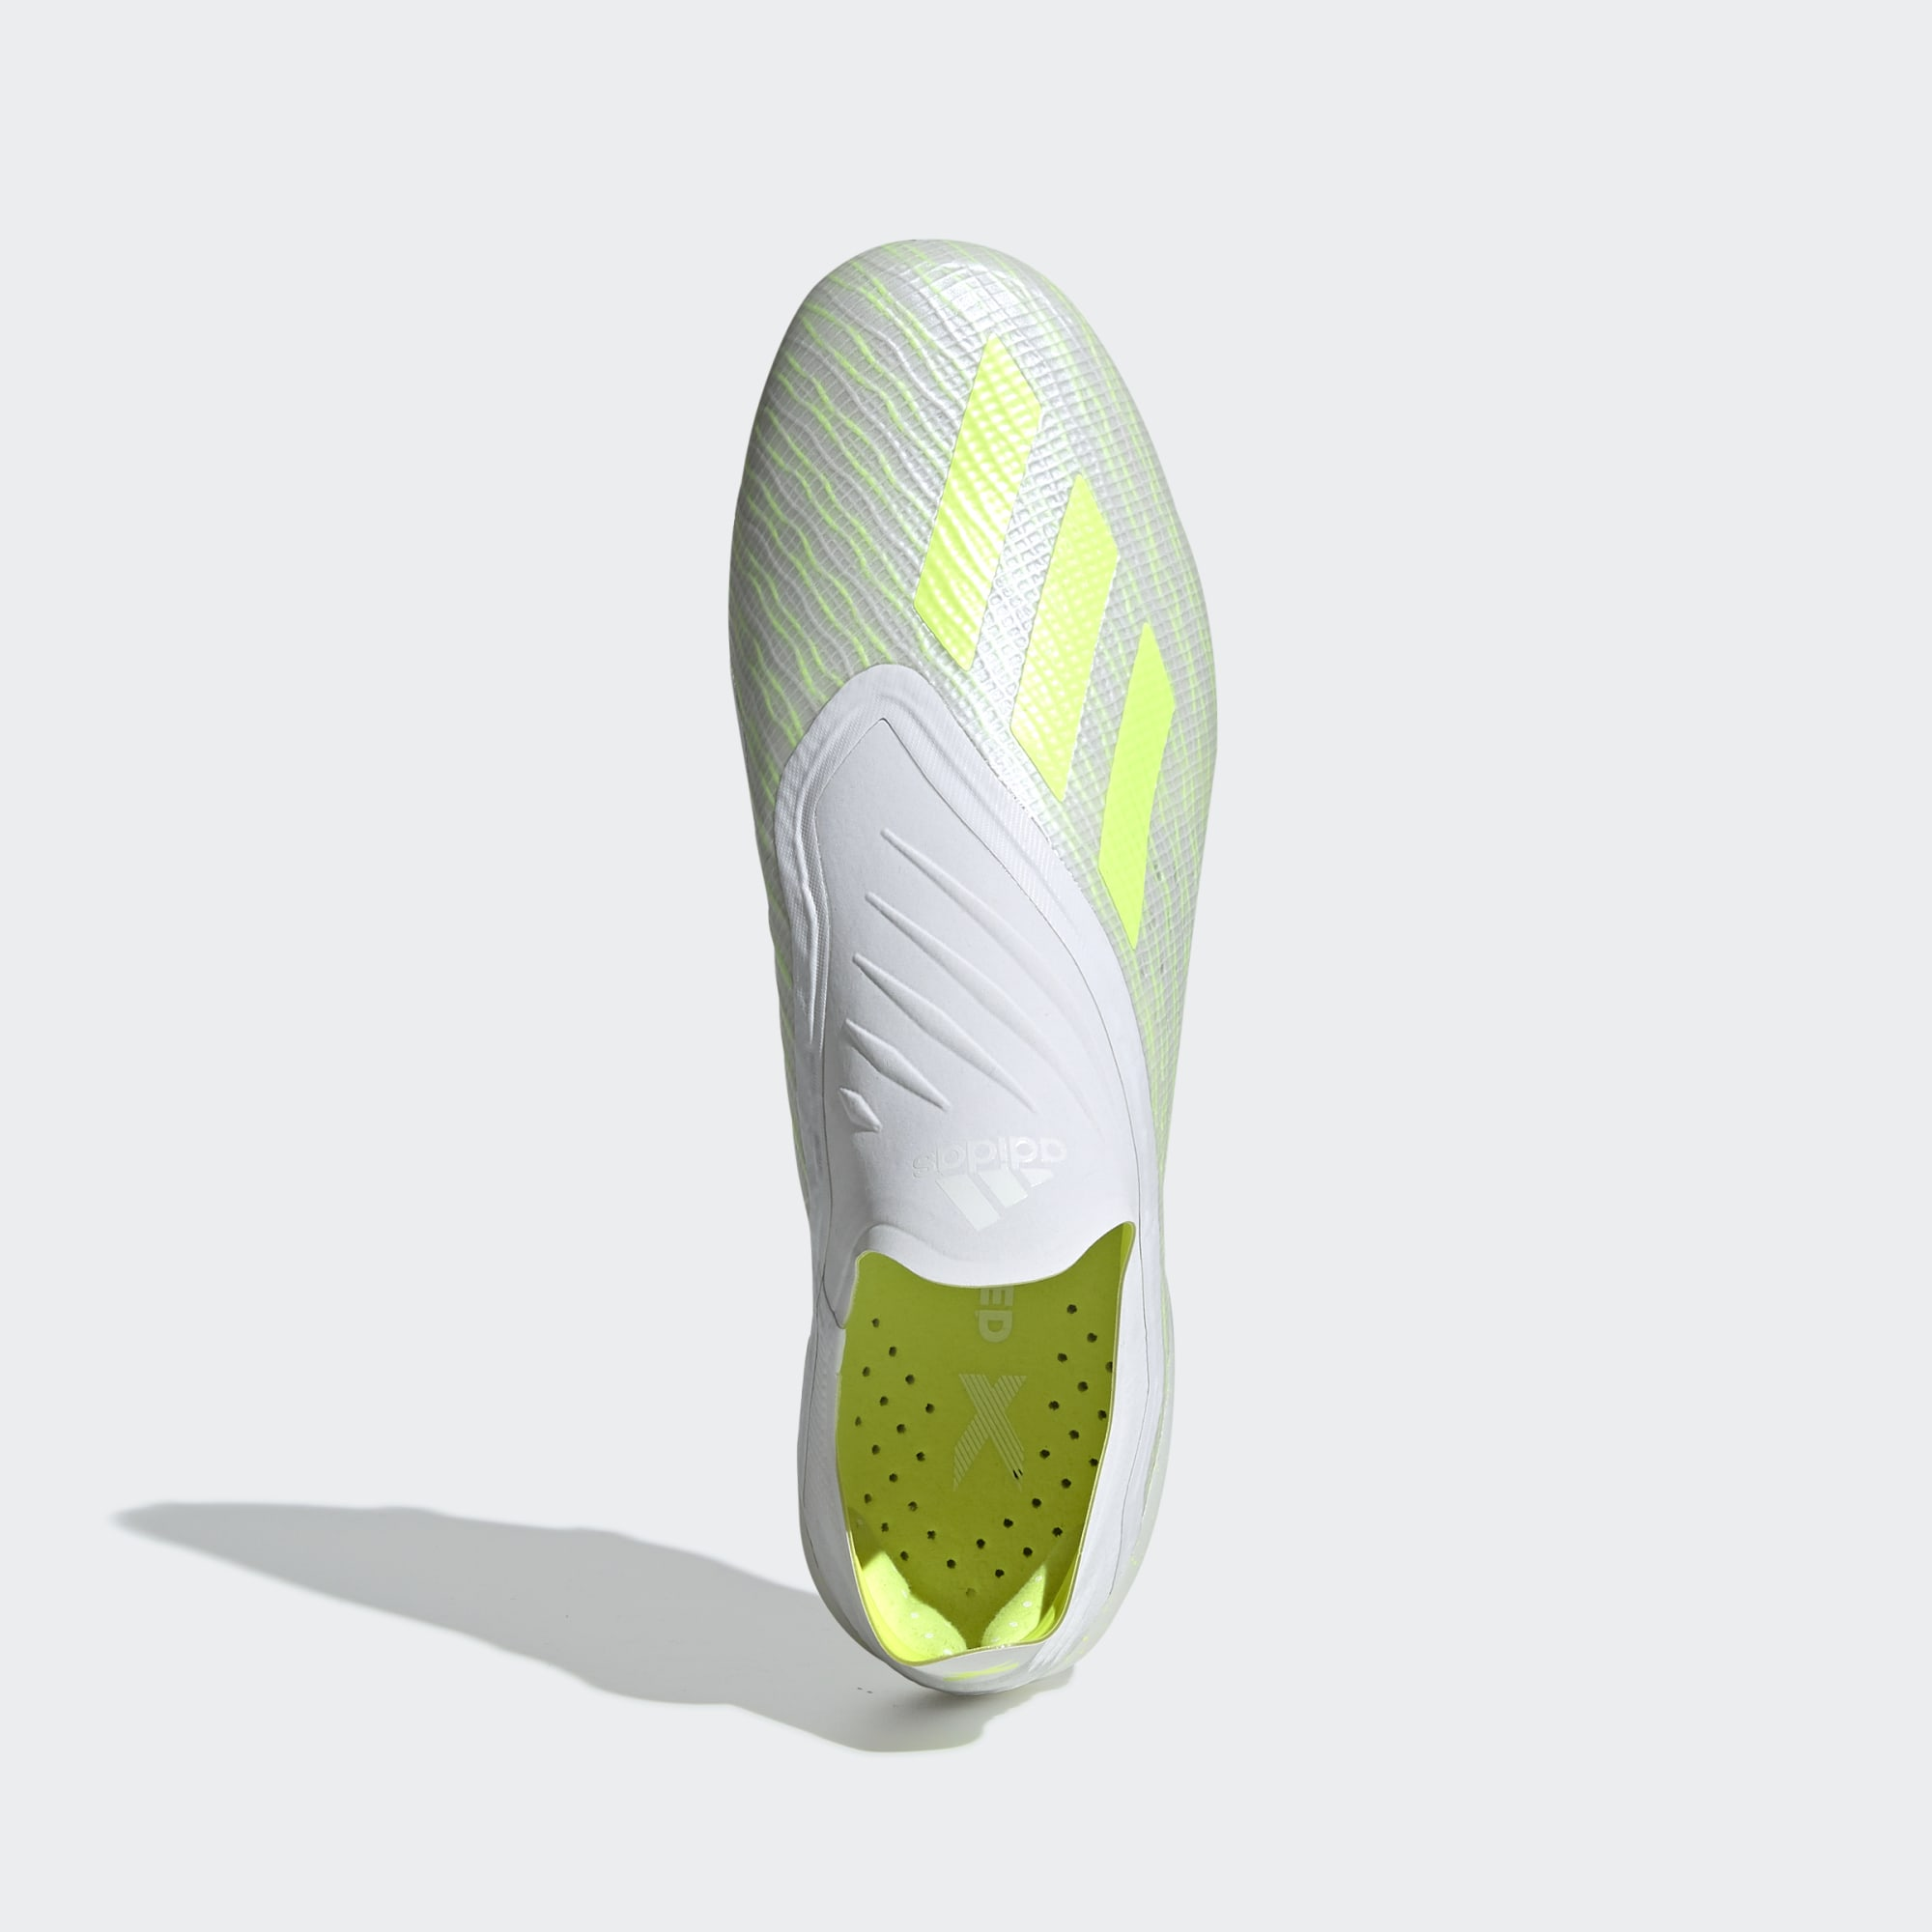 7d97d926 Футбольные бутсы X 18+ FG BB9338 adidas Performance - Украина ...